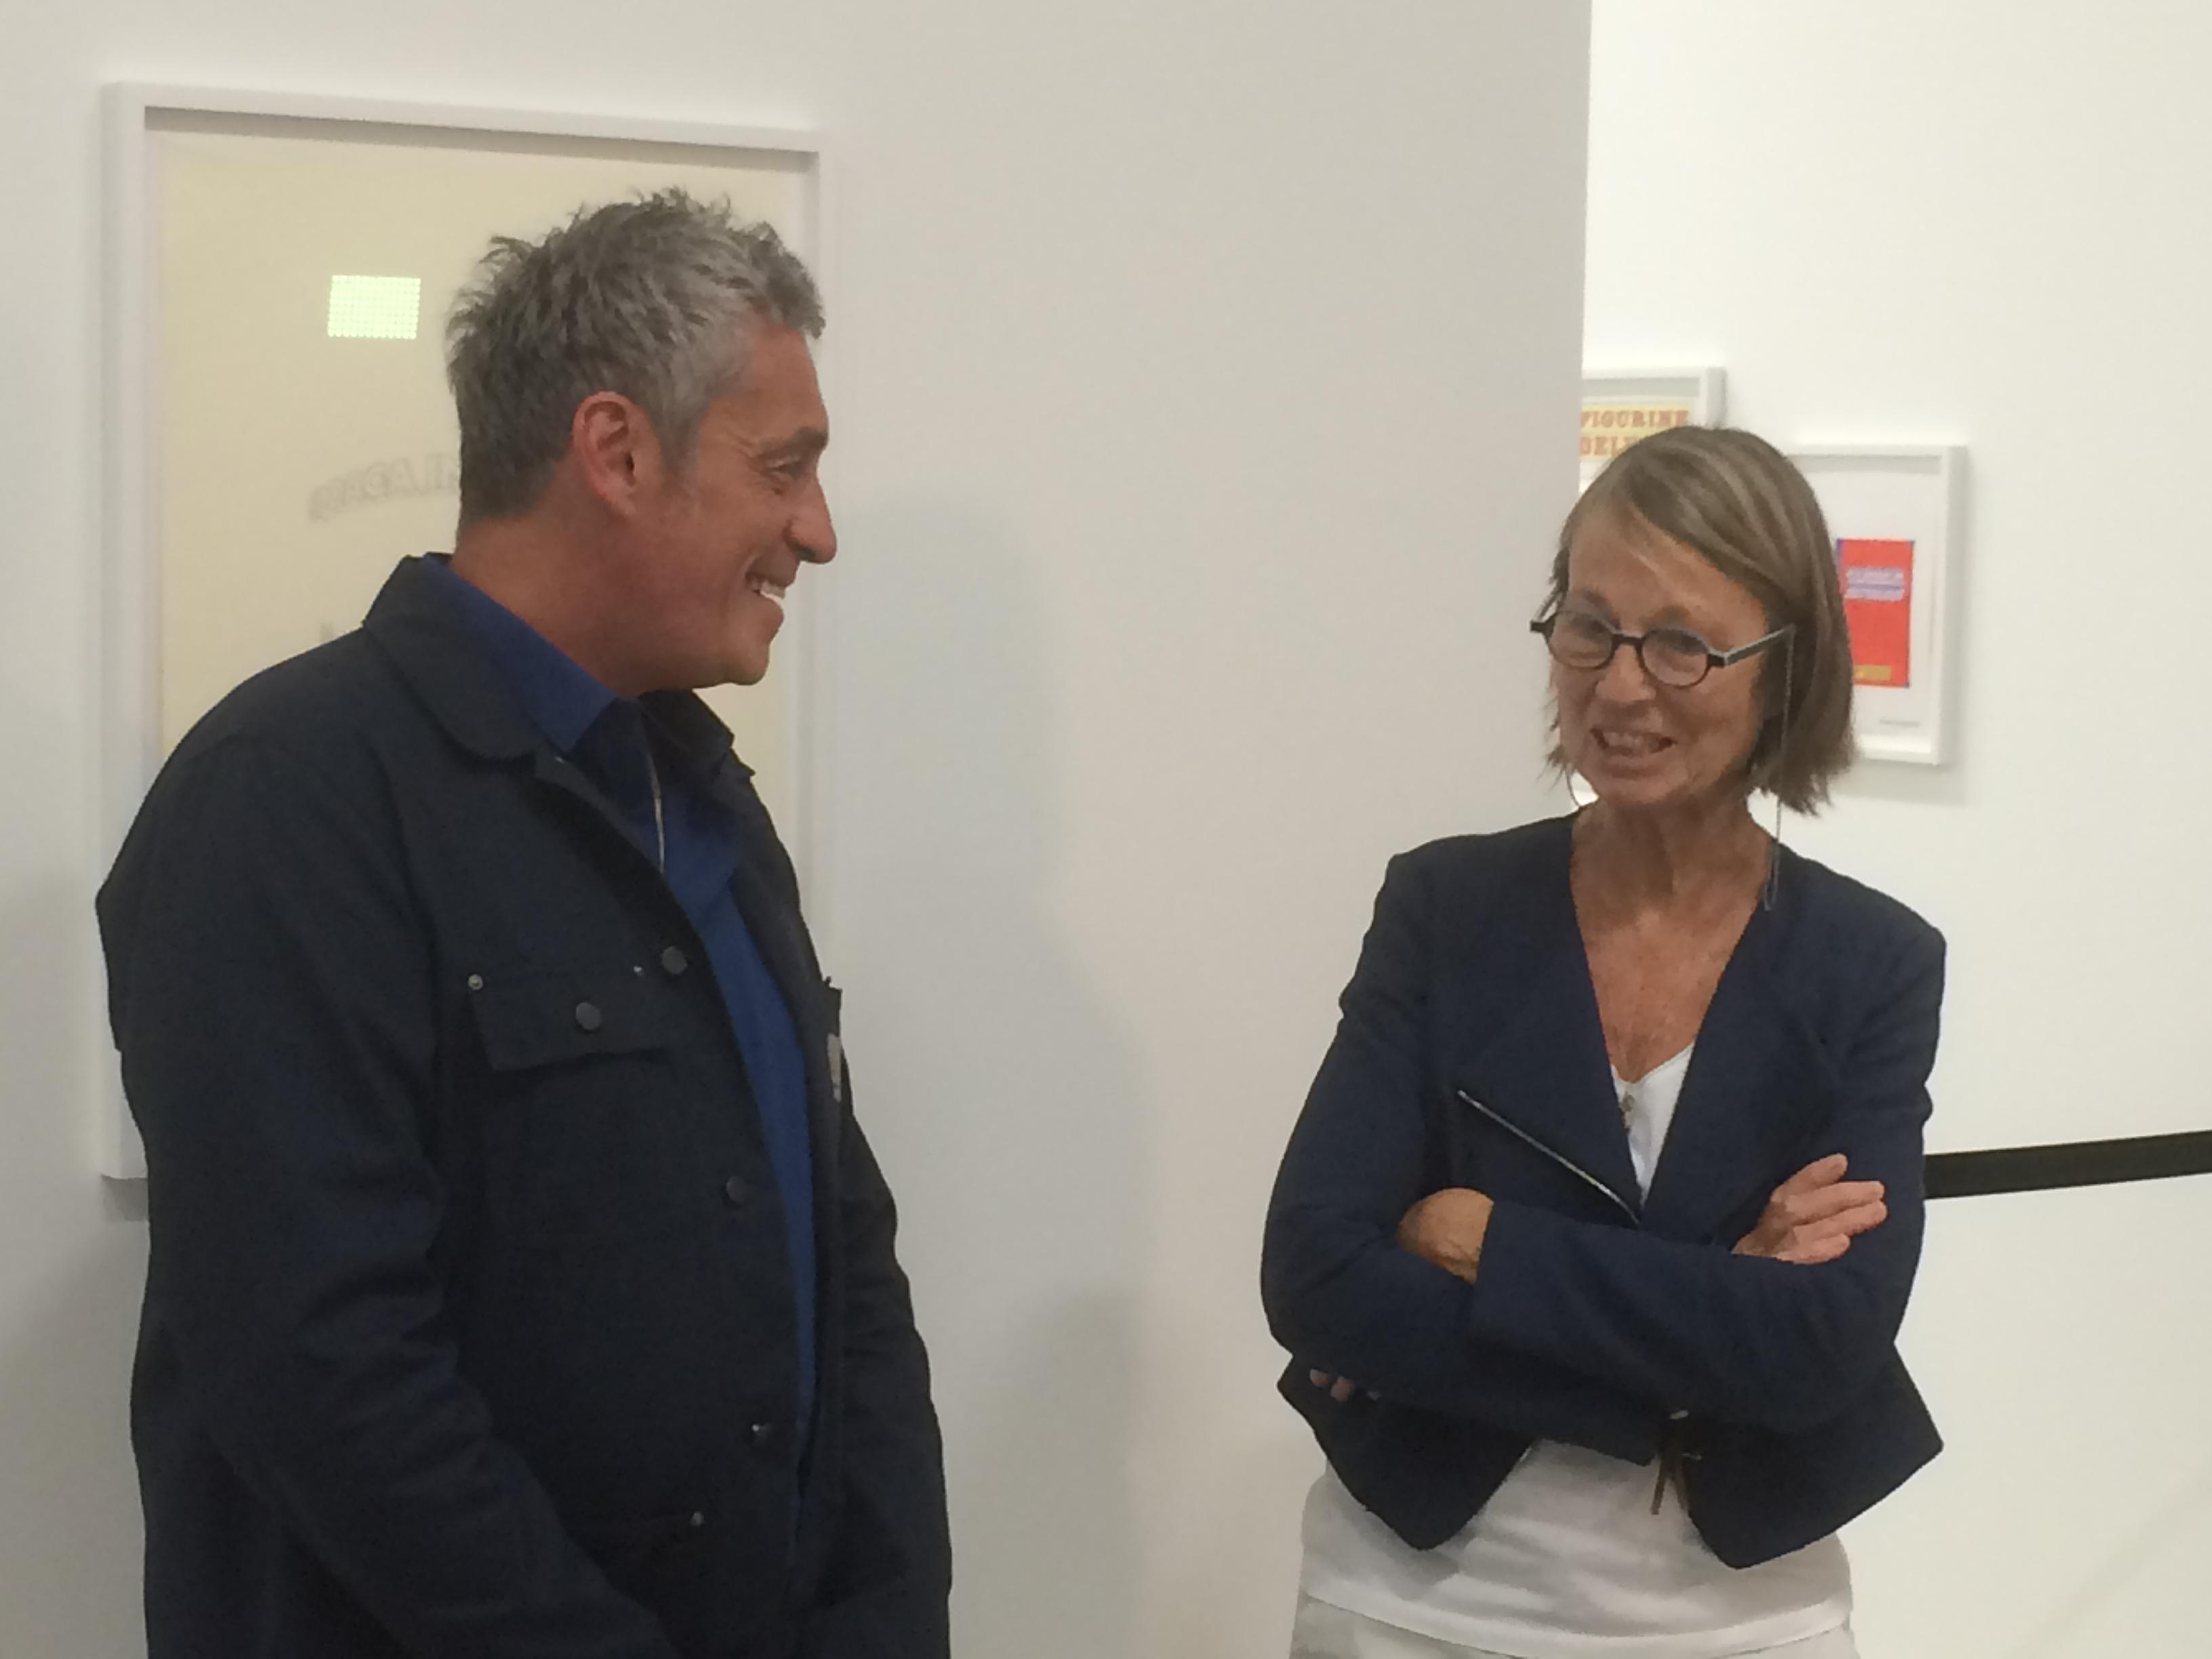 Philippe Saurel et Françoise Nyssen photo JMDI